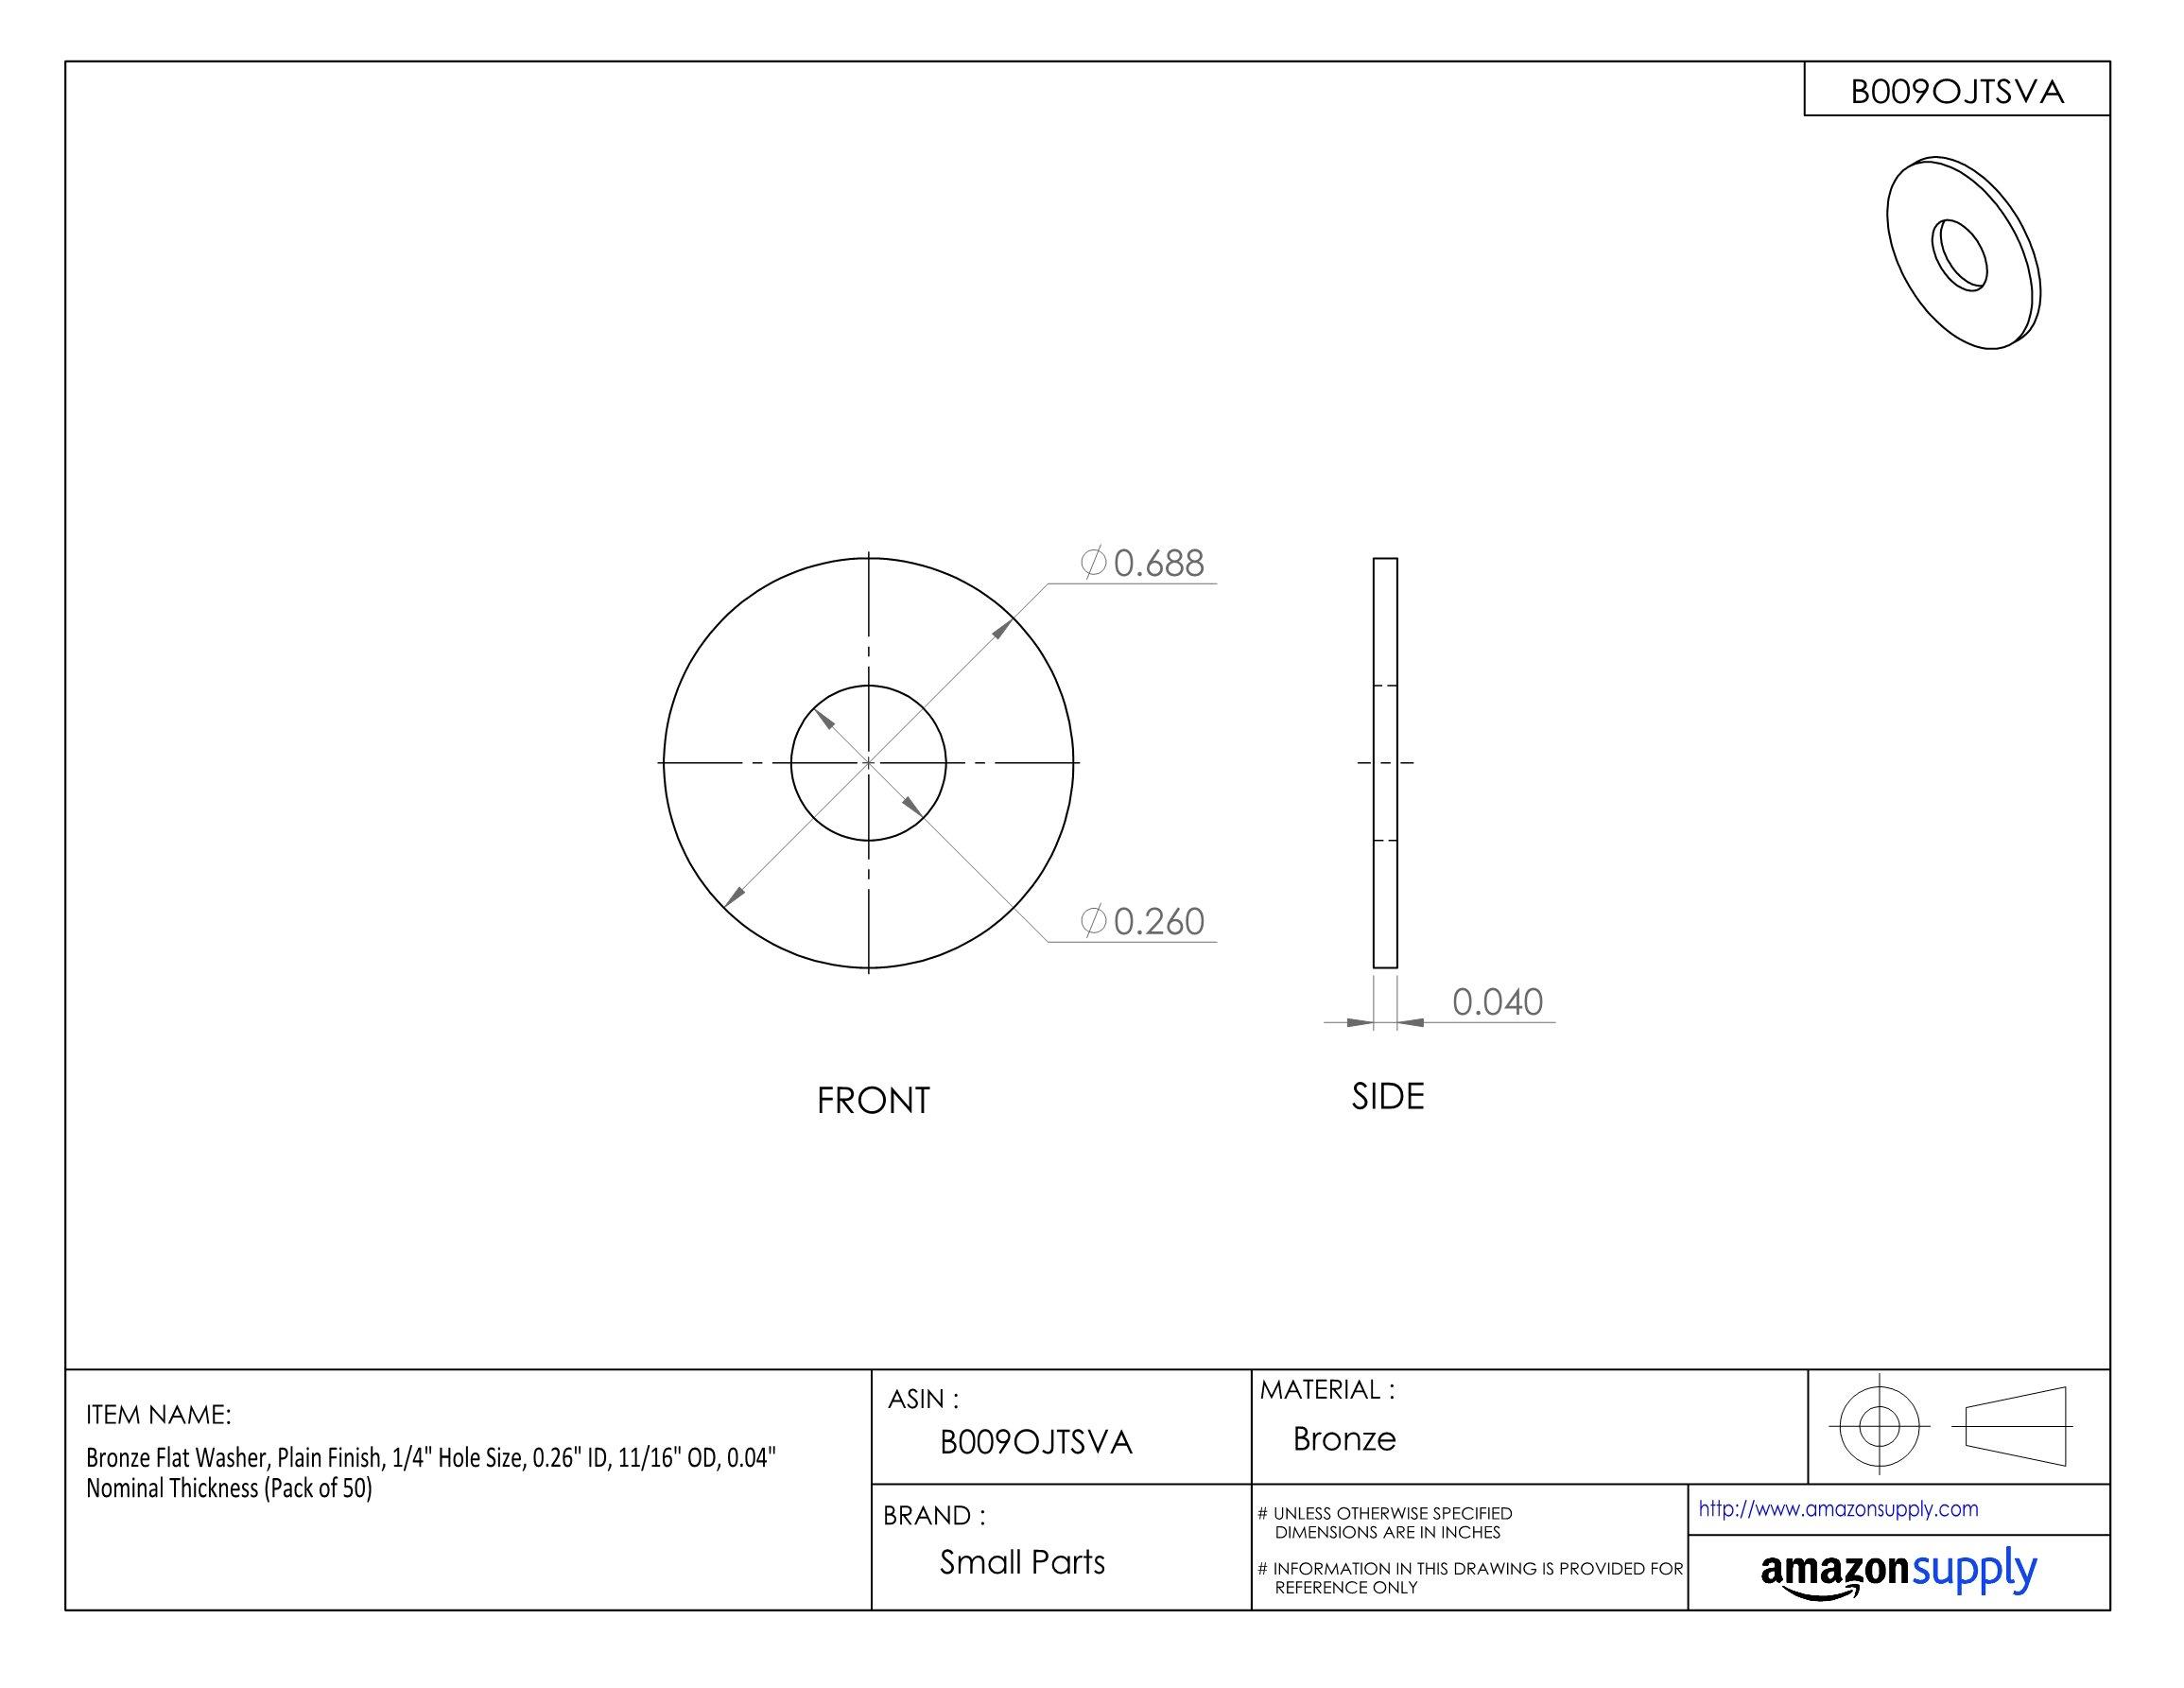 Bronze Flat Washer, Plain Finish, 1/4'' Hole Size, 0.26'' ID, 11/16'' OD, 0.04'' Nominal Thickness (Pack of 50)